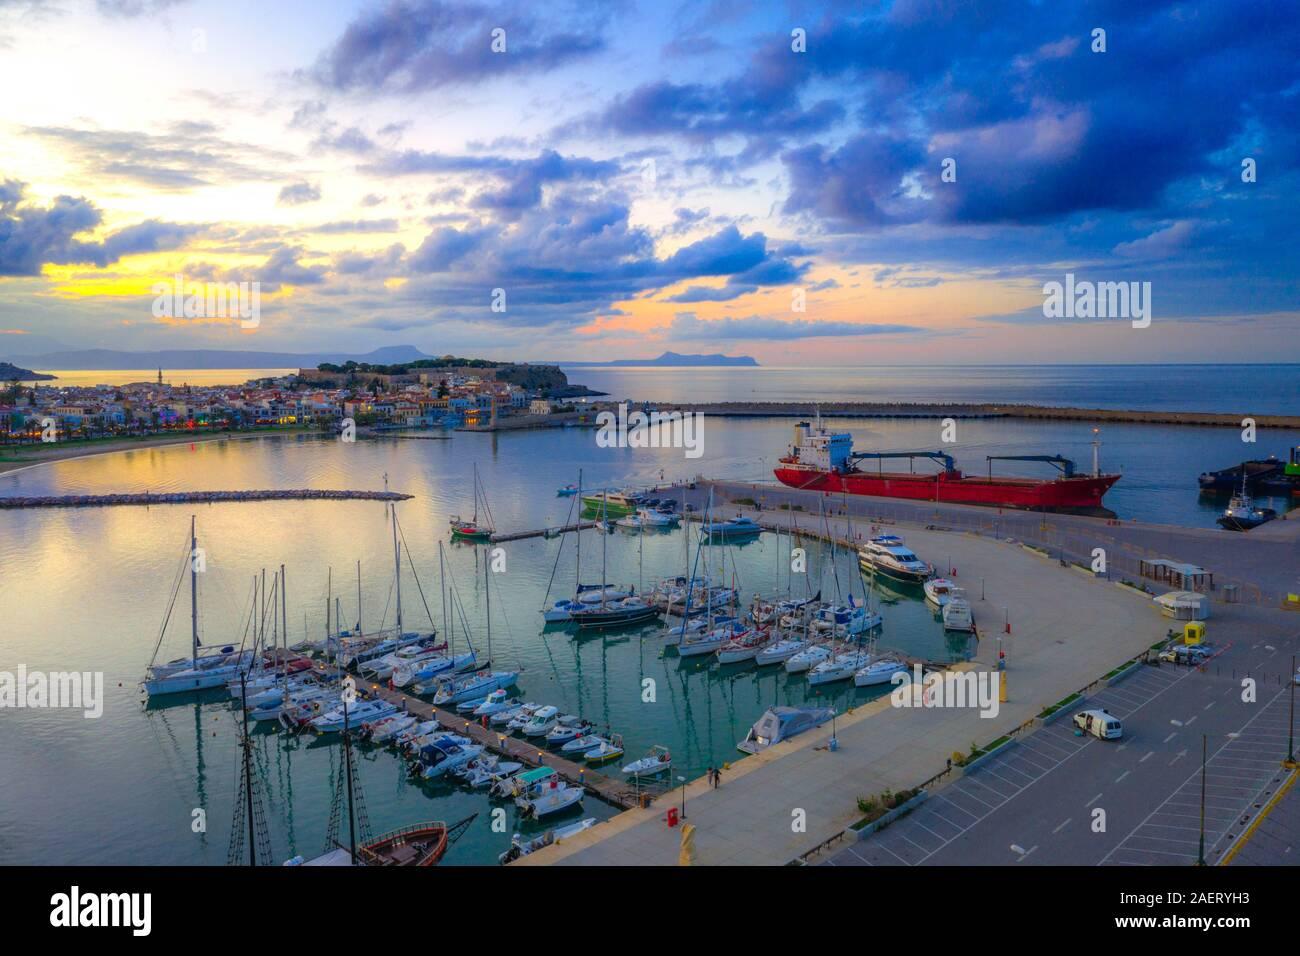 Rethimno city with the fortress of Fortezza, Crete, Greece. Stock Photo